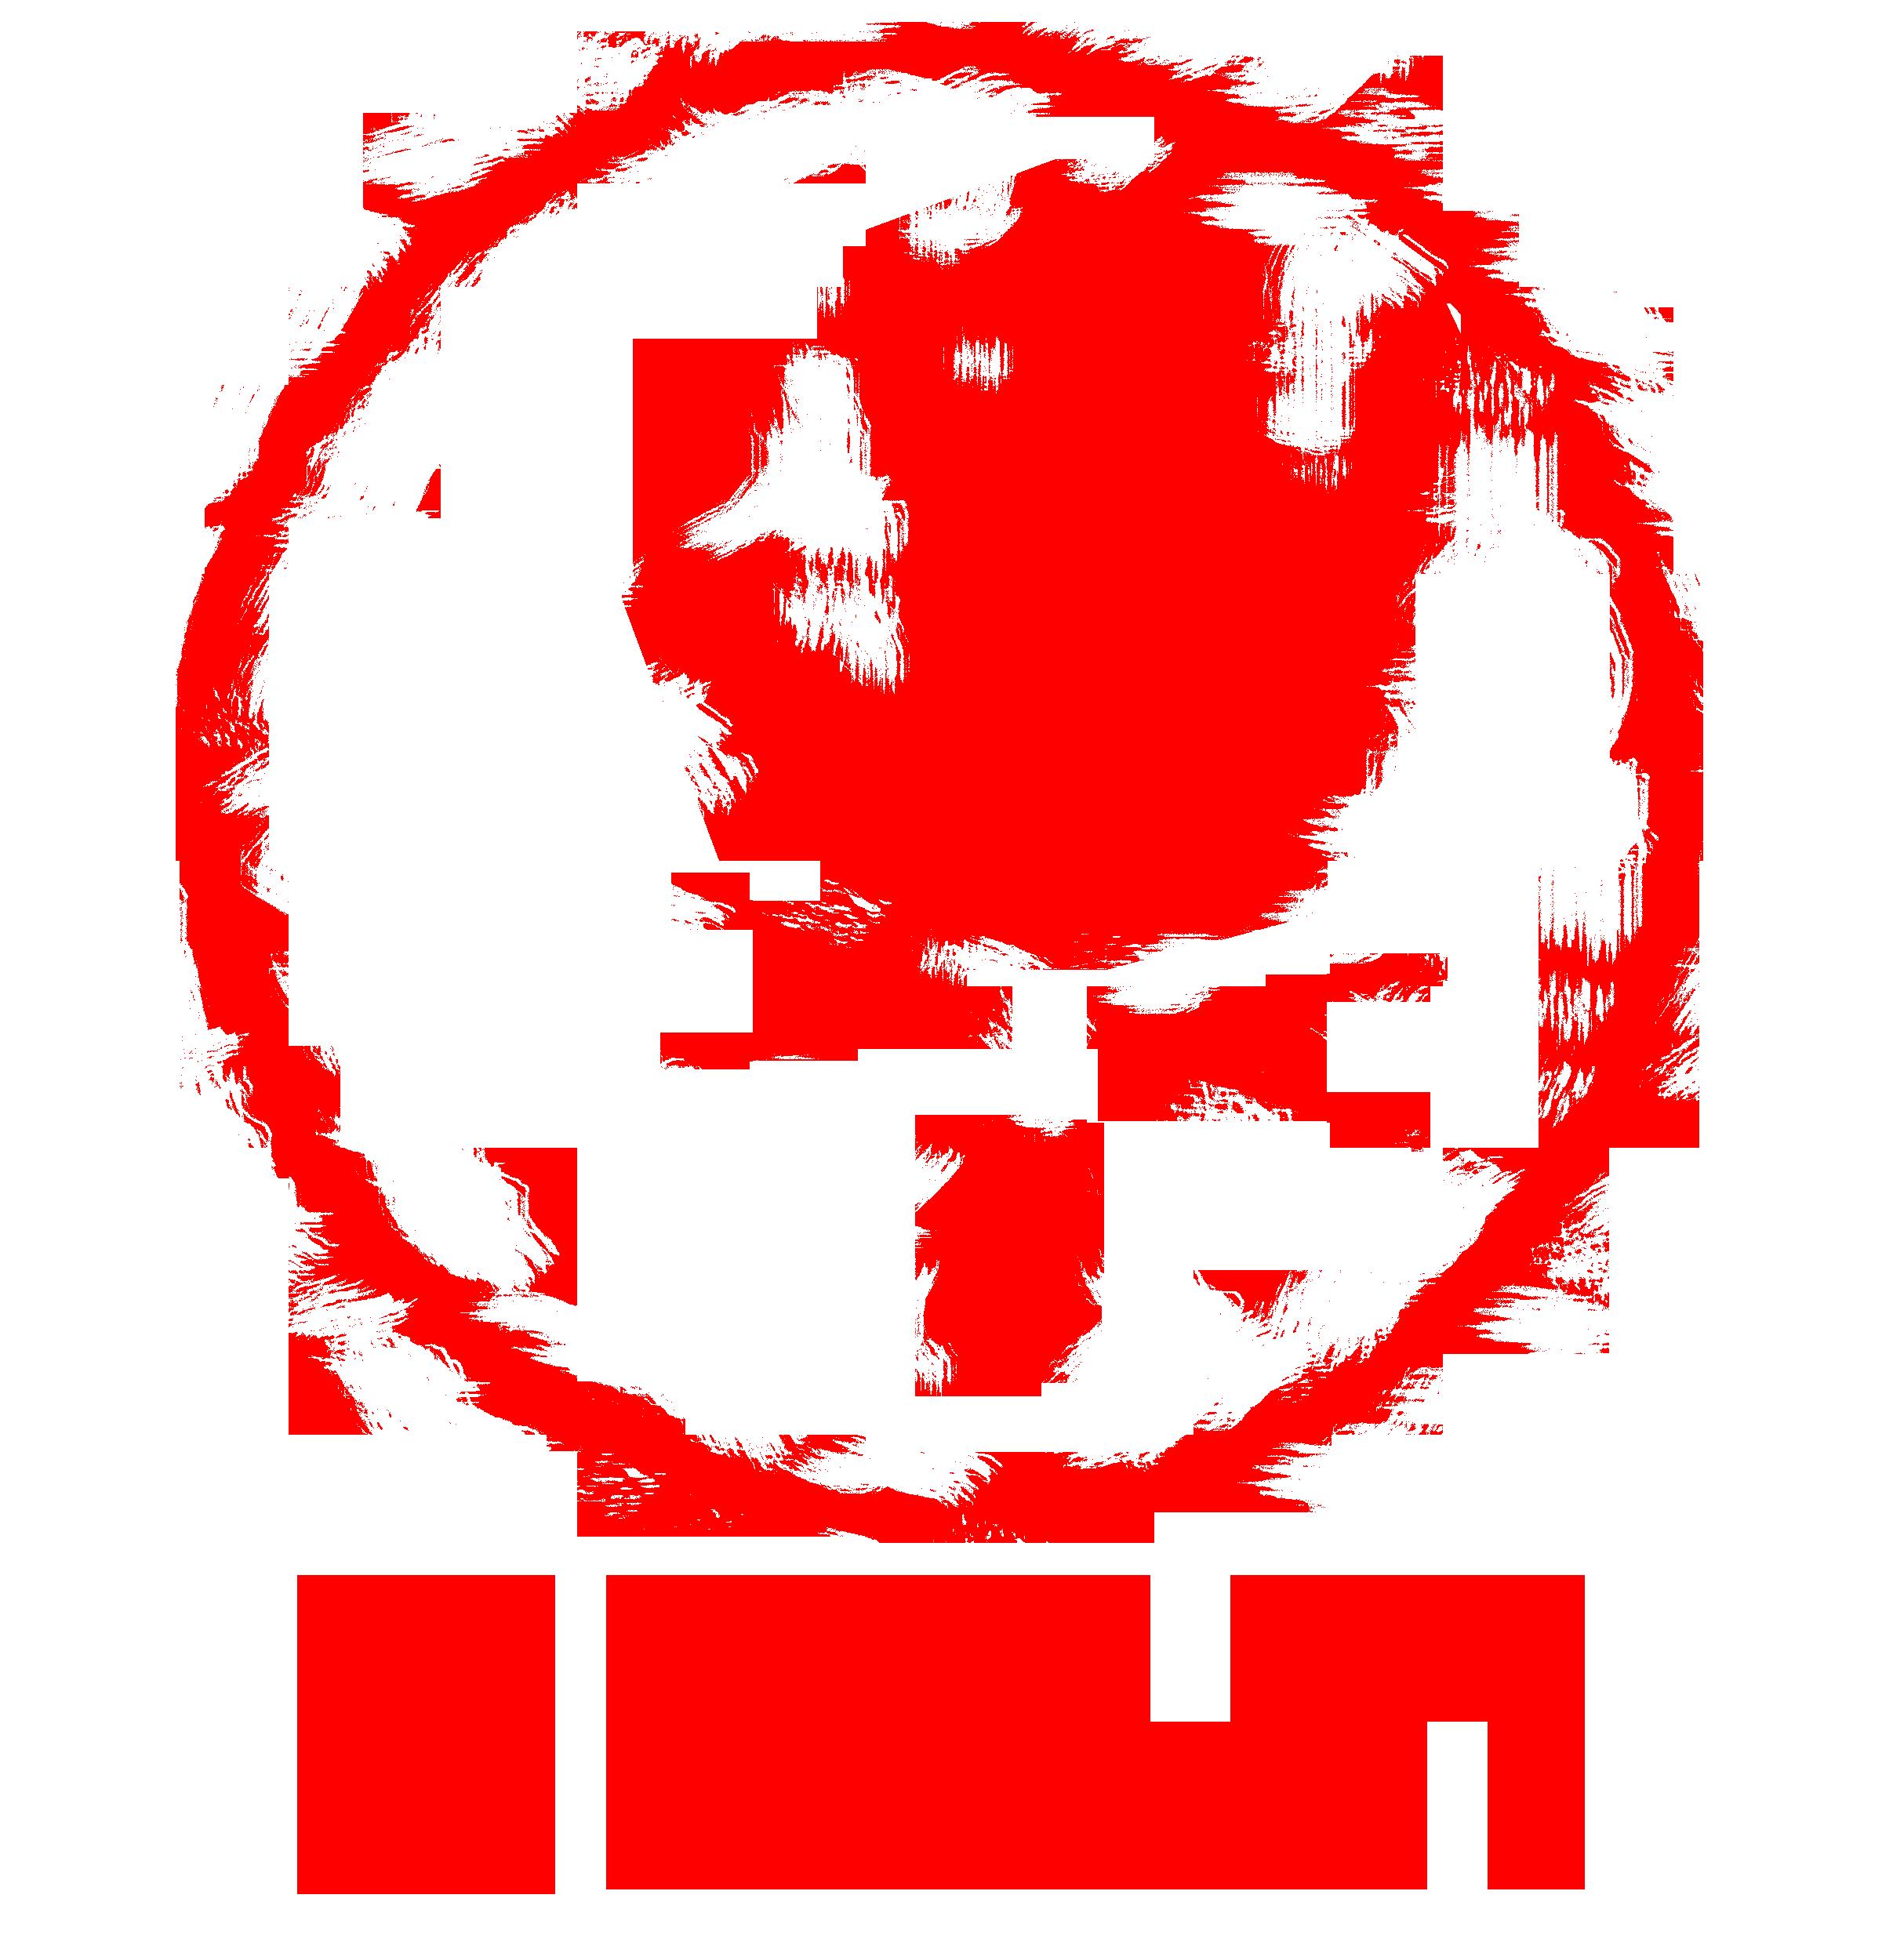 uraficopy2